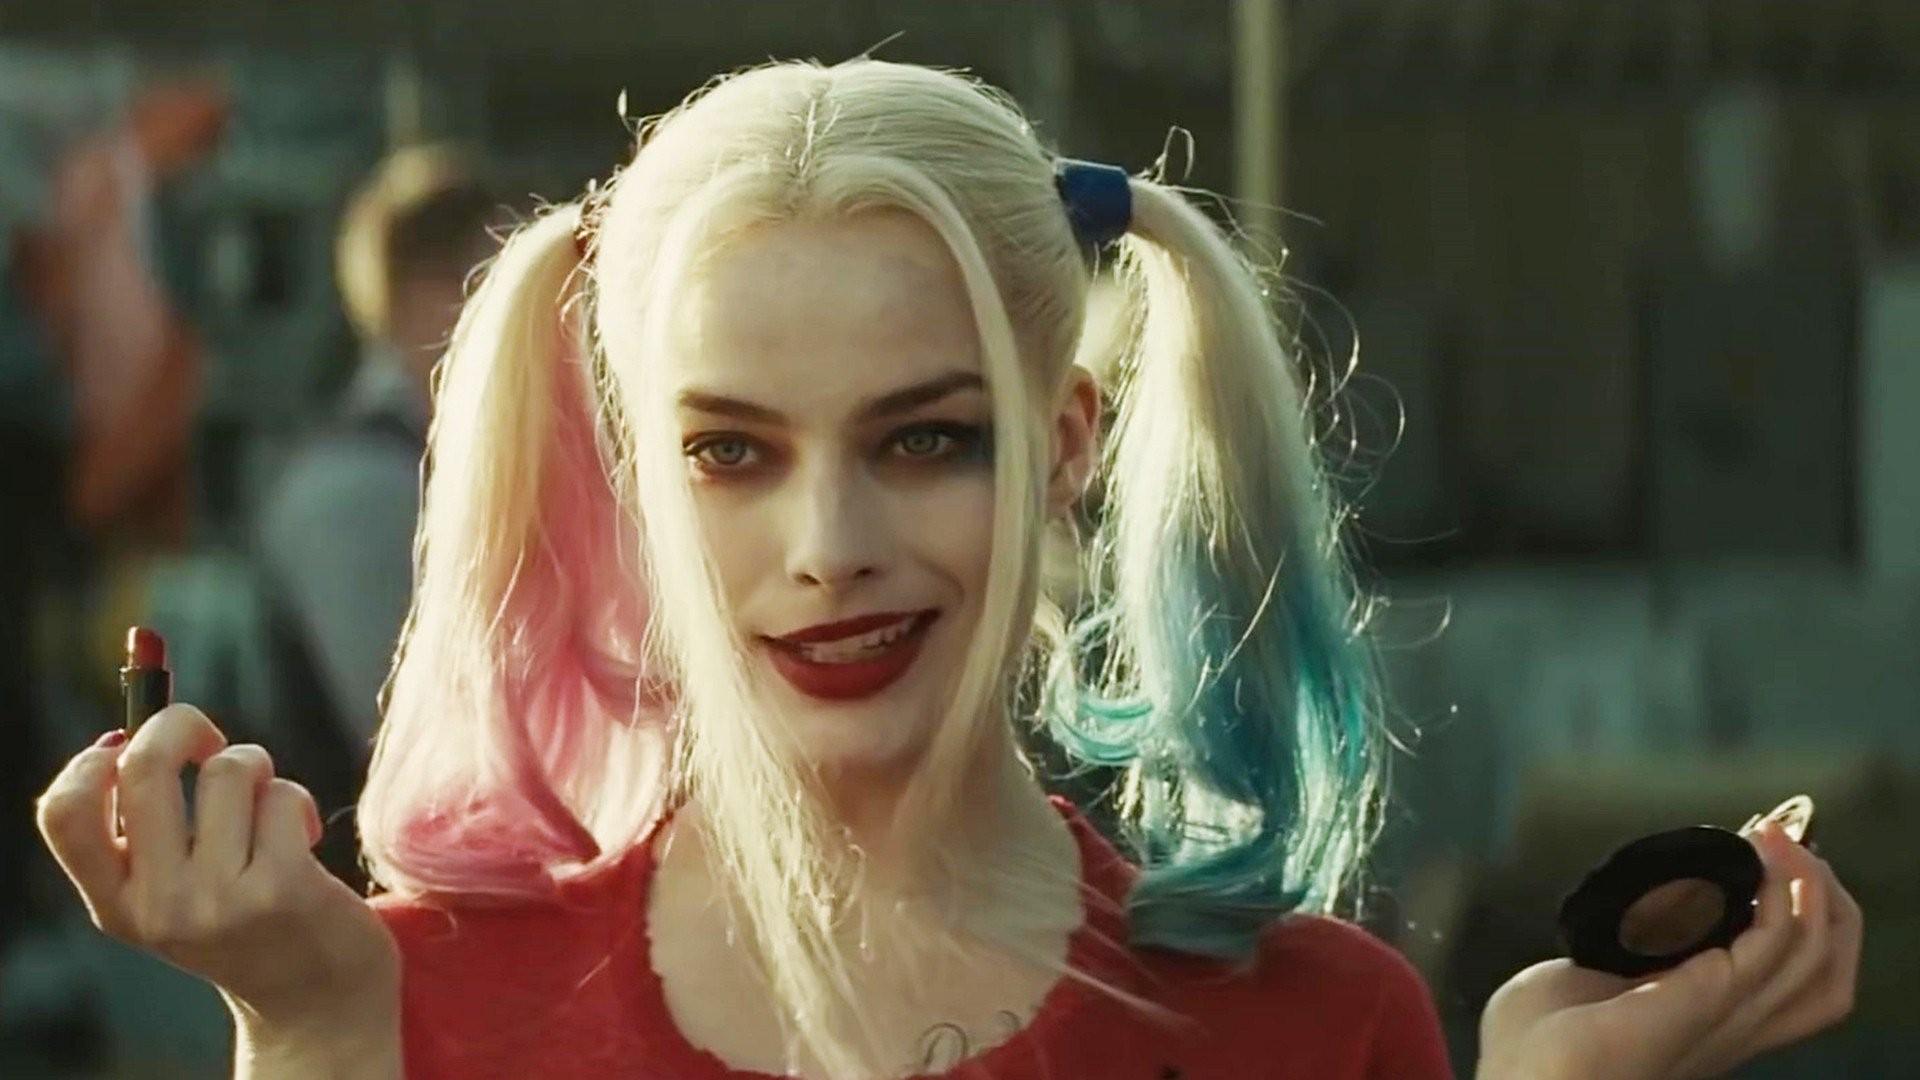 Margot Robbie is an Executive Producer on Harley Quinn .